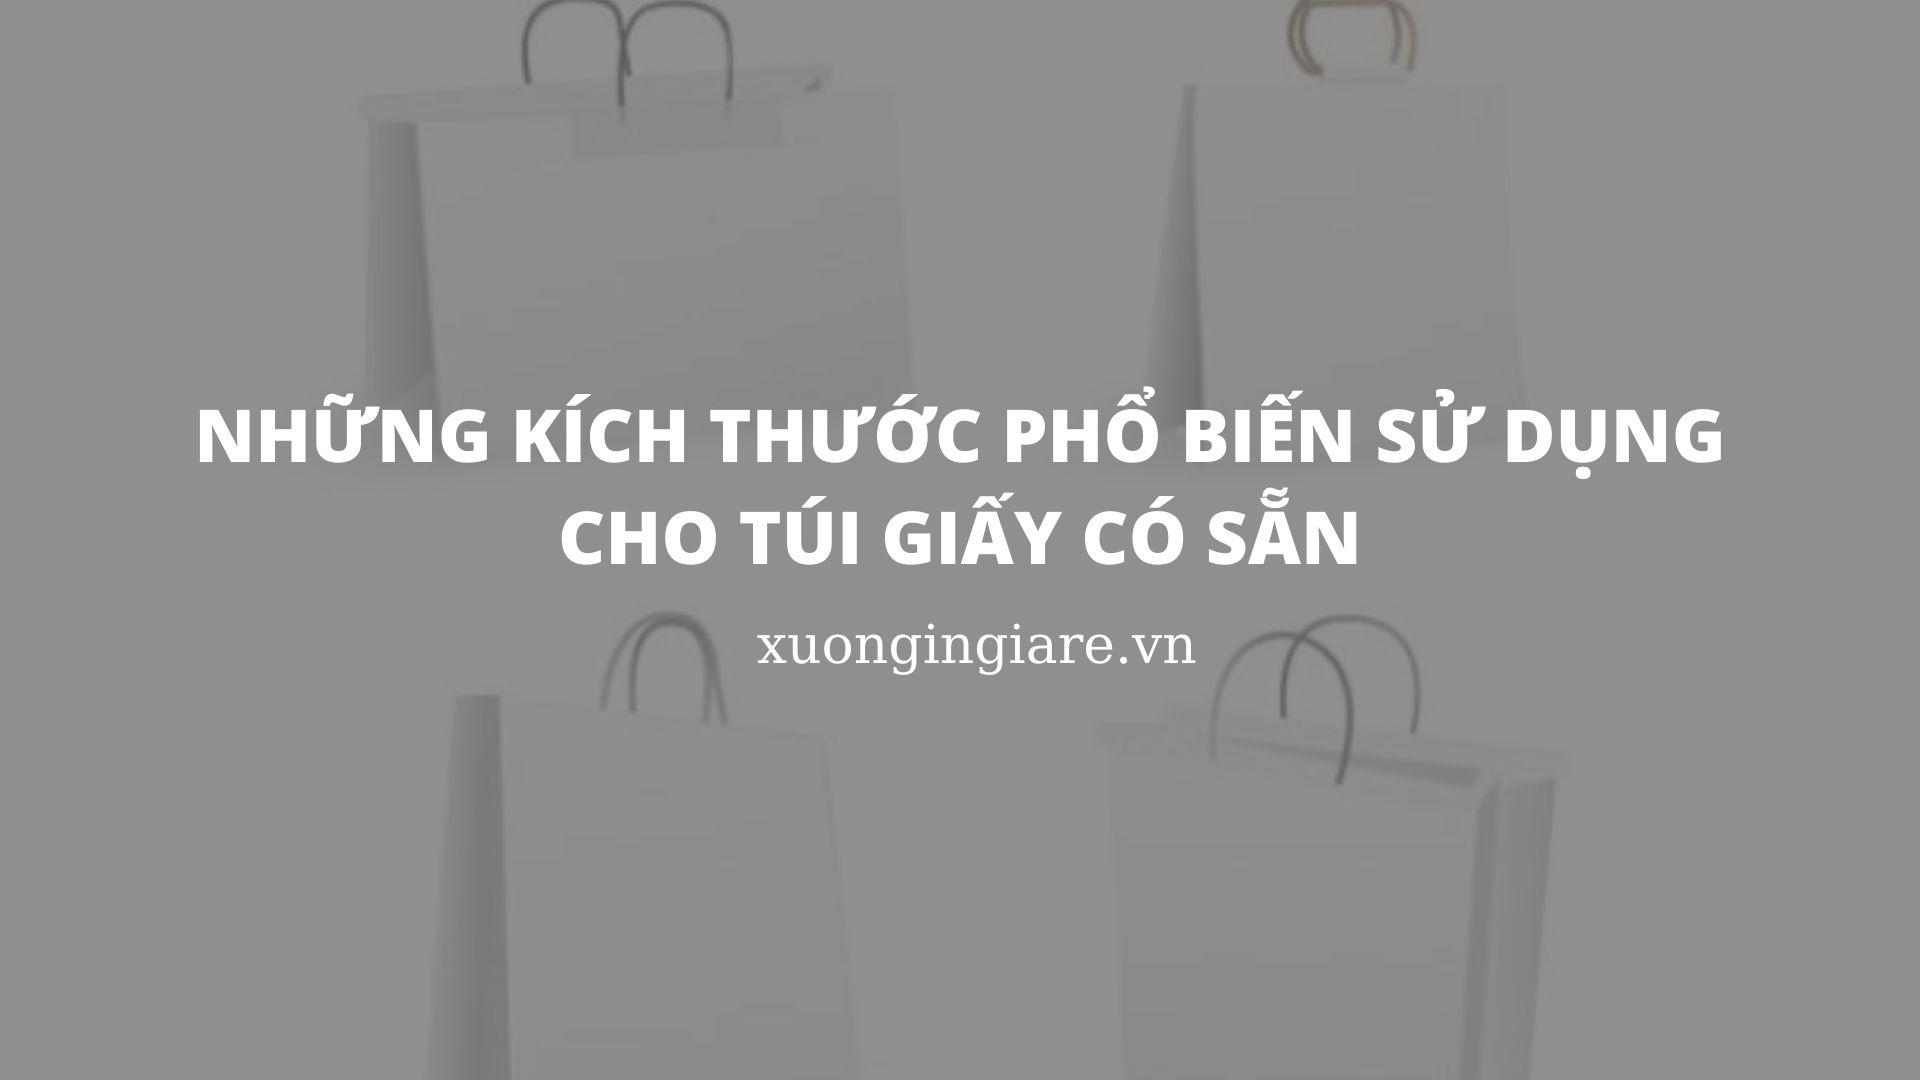 nhung-kich-thuoc-pho-bien-su-dung-cho-tui-giay-co-san